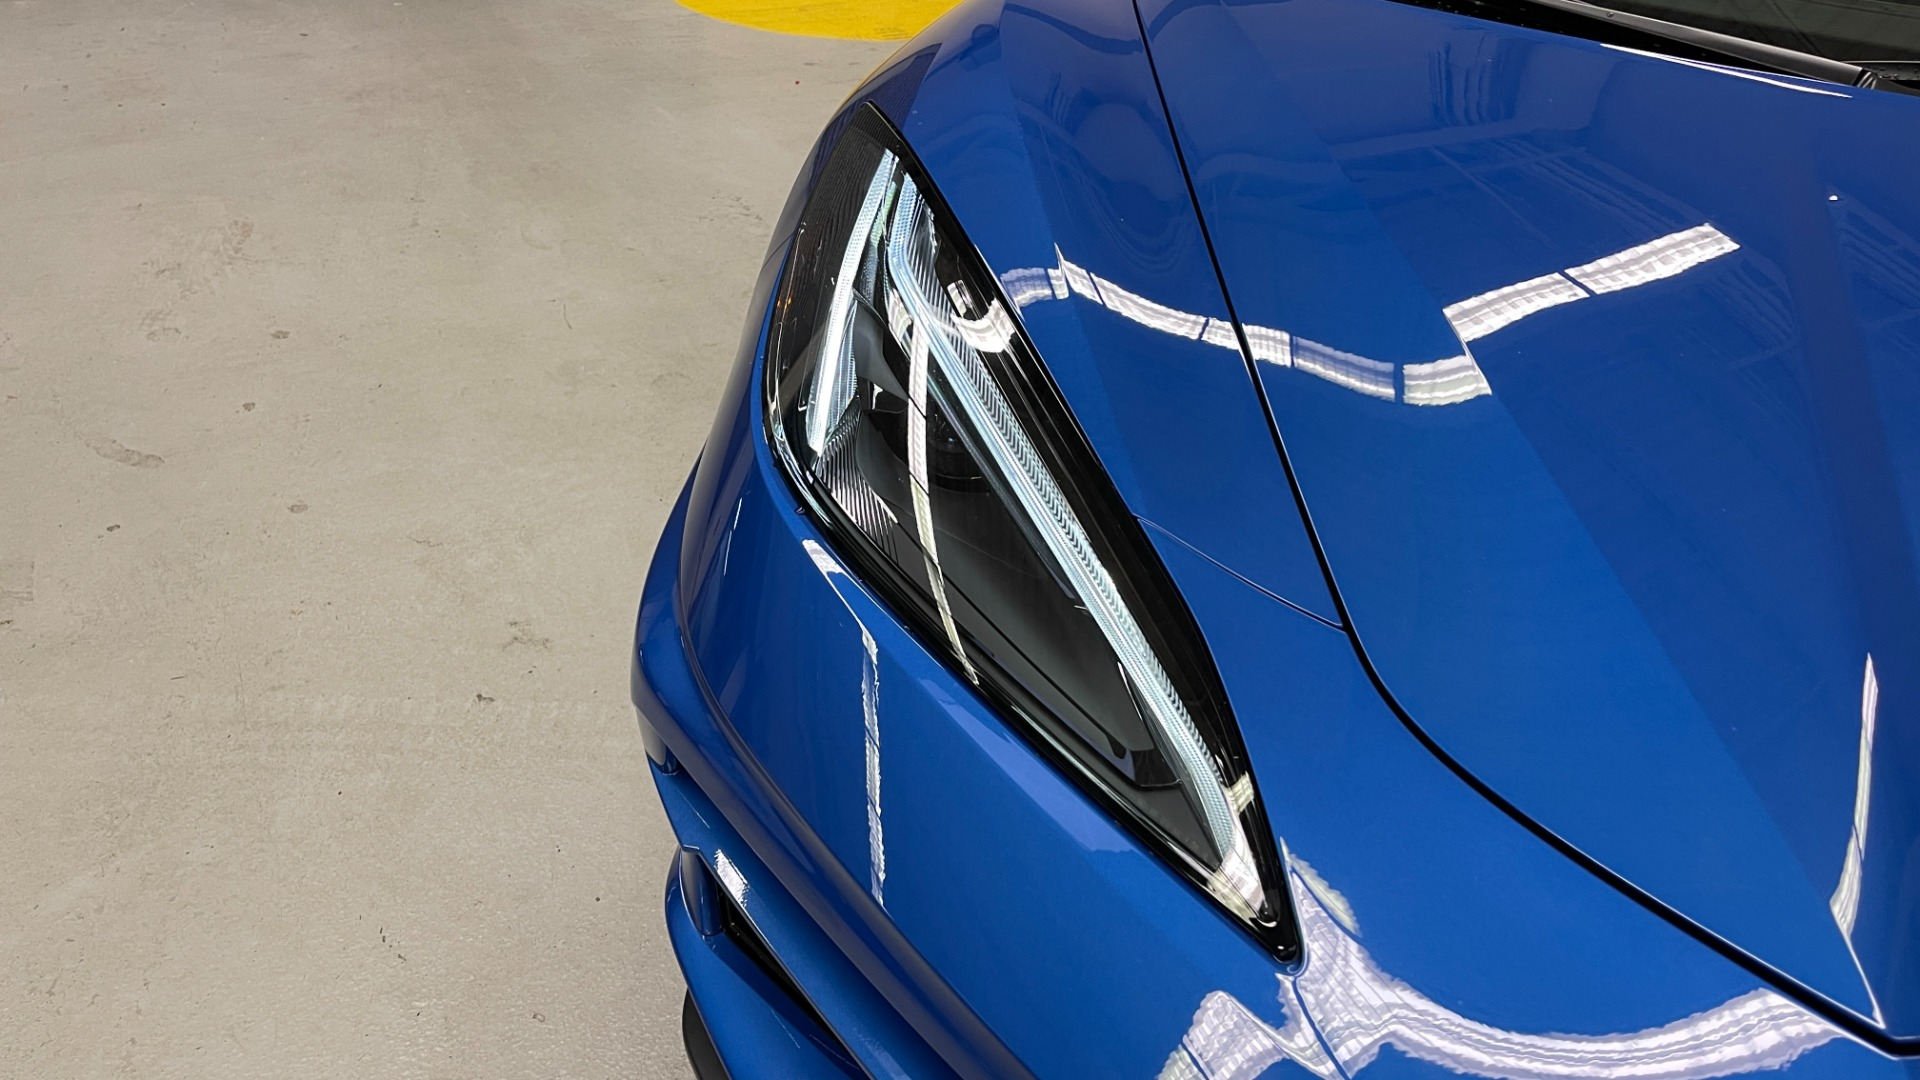 Used 2021 Chevrolet CORVETTE STINGRAY 3LT COUPE / 8-SPD / PERF PKG / NAV / BOSE / REARVIEW for sale $110,995 at Formula Imports in Charlotte NC 28227 24